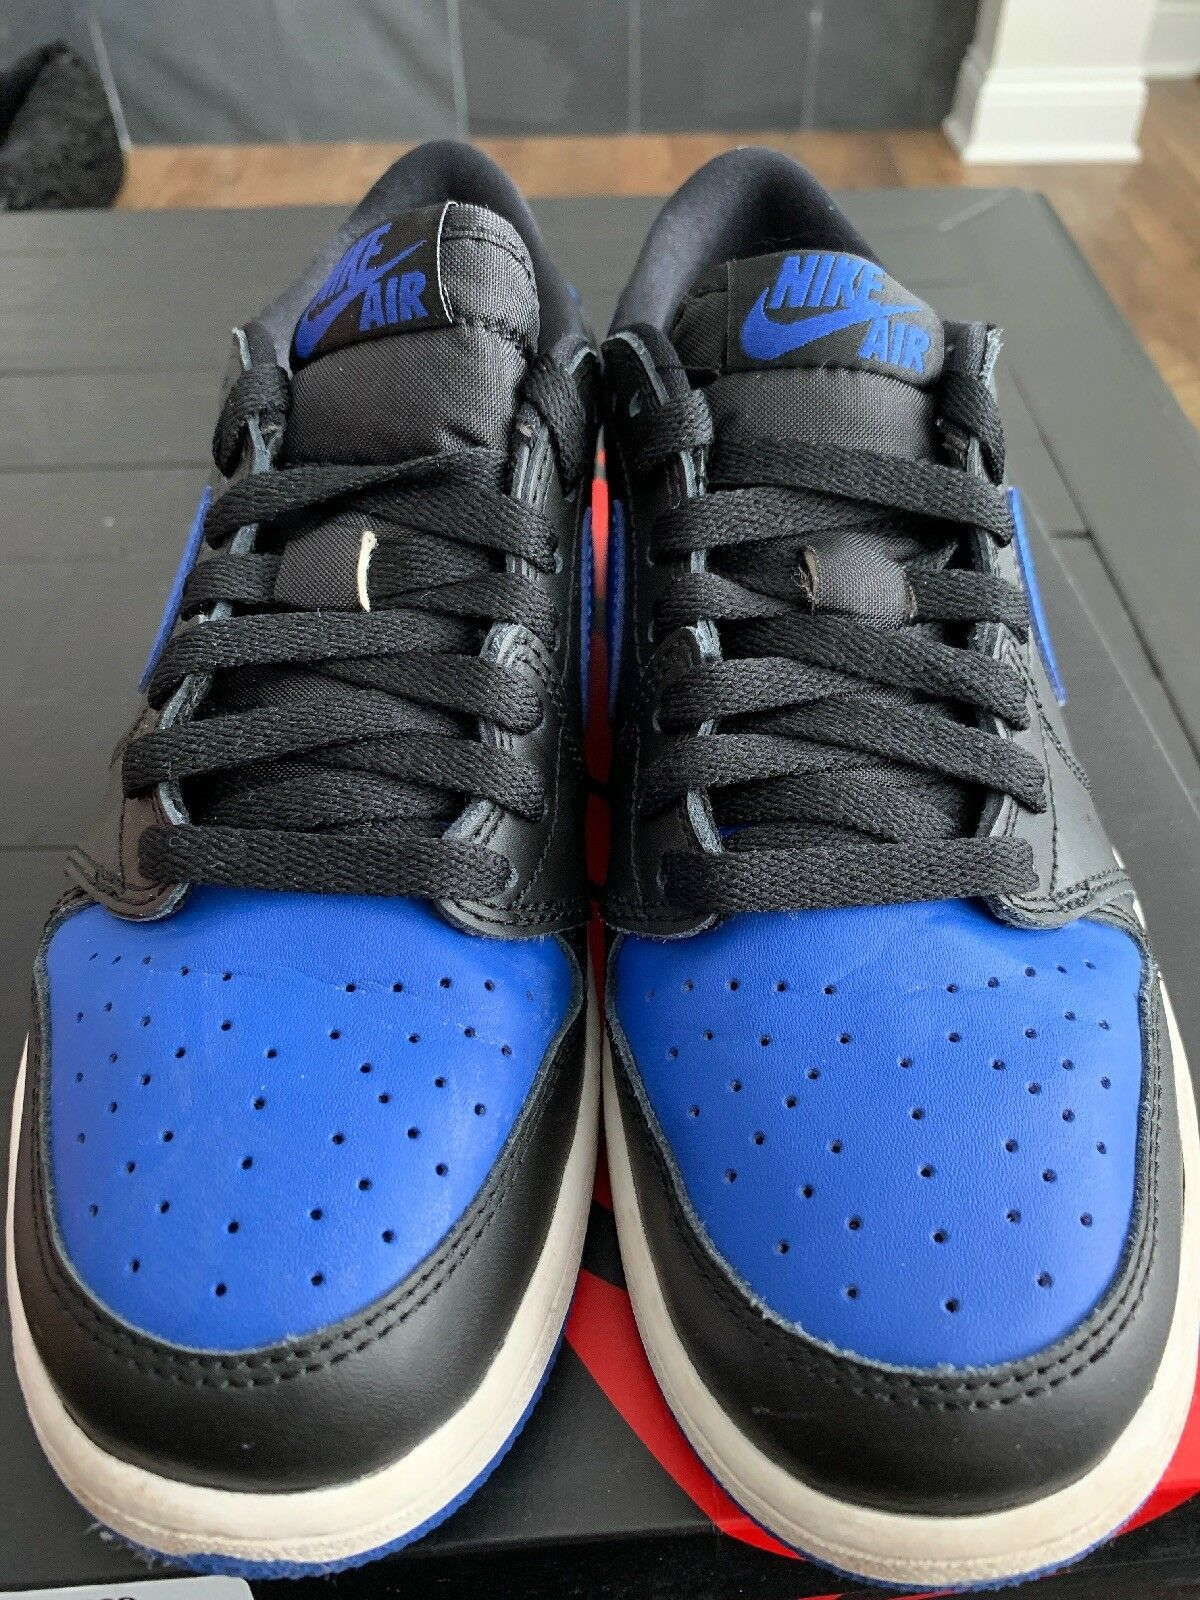 RARE   Boys Air Jordan 1 Retro Low OG NEW Size 5.5